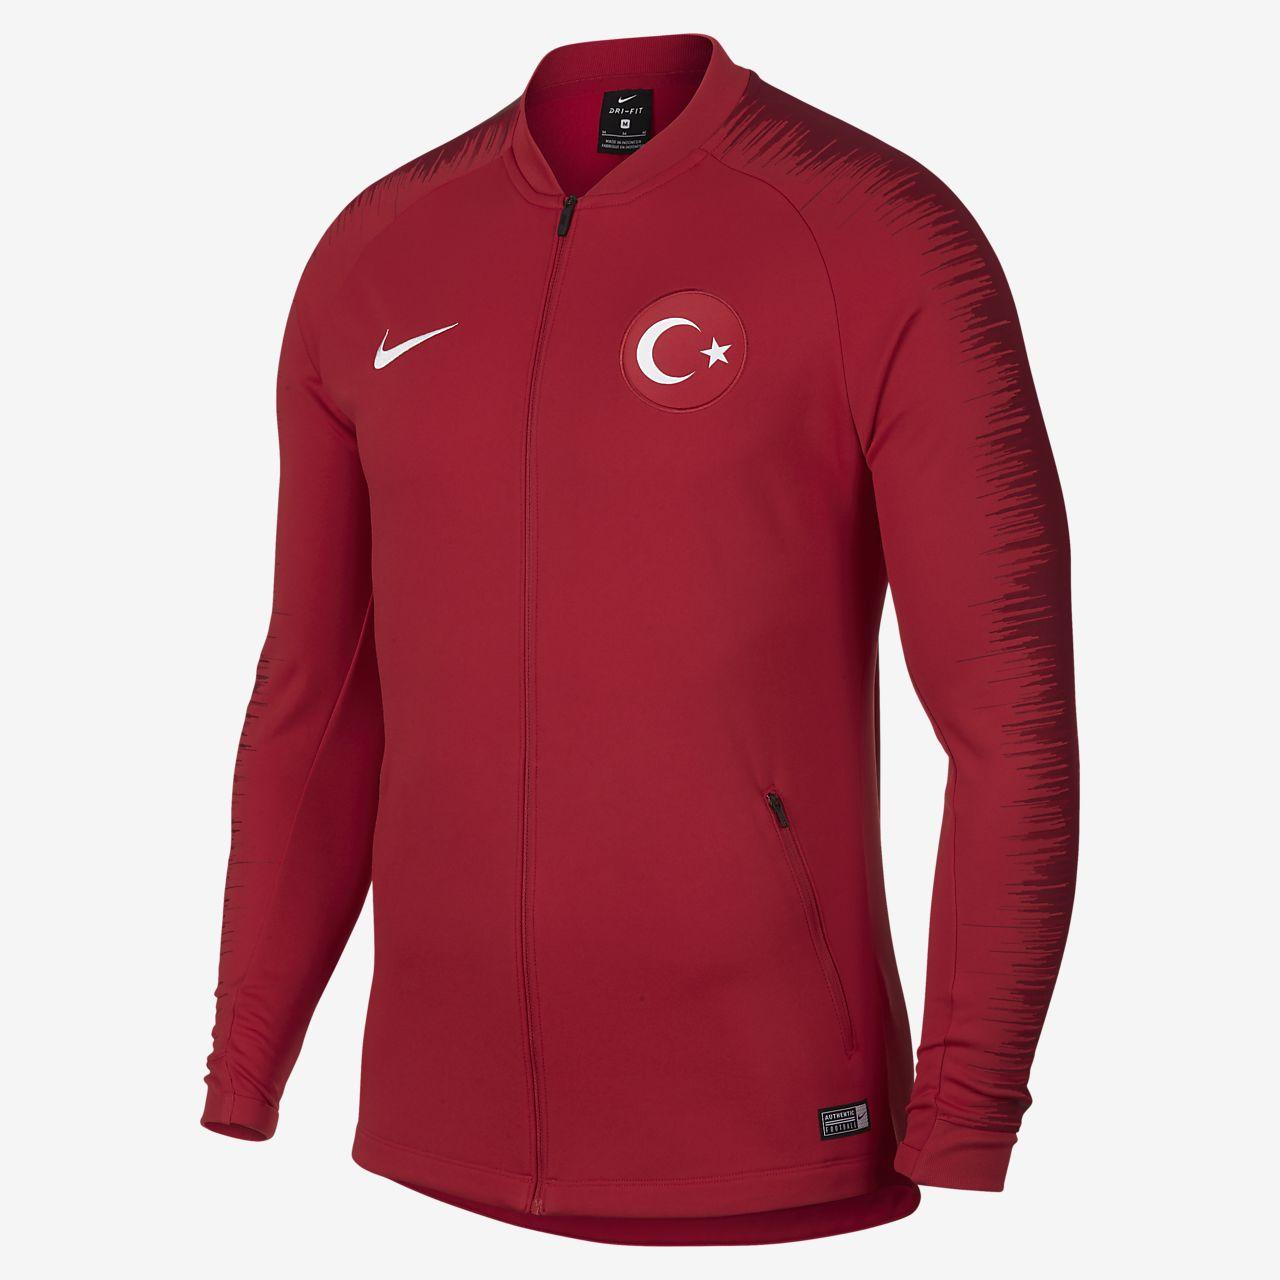 db5e70923 Turkey Anthem Men's Football Jacket. Nike.com EG